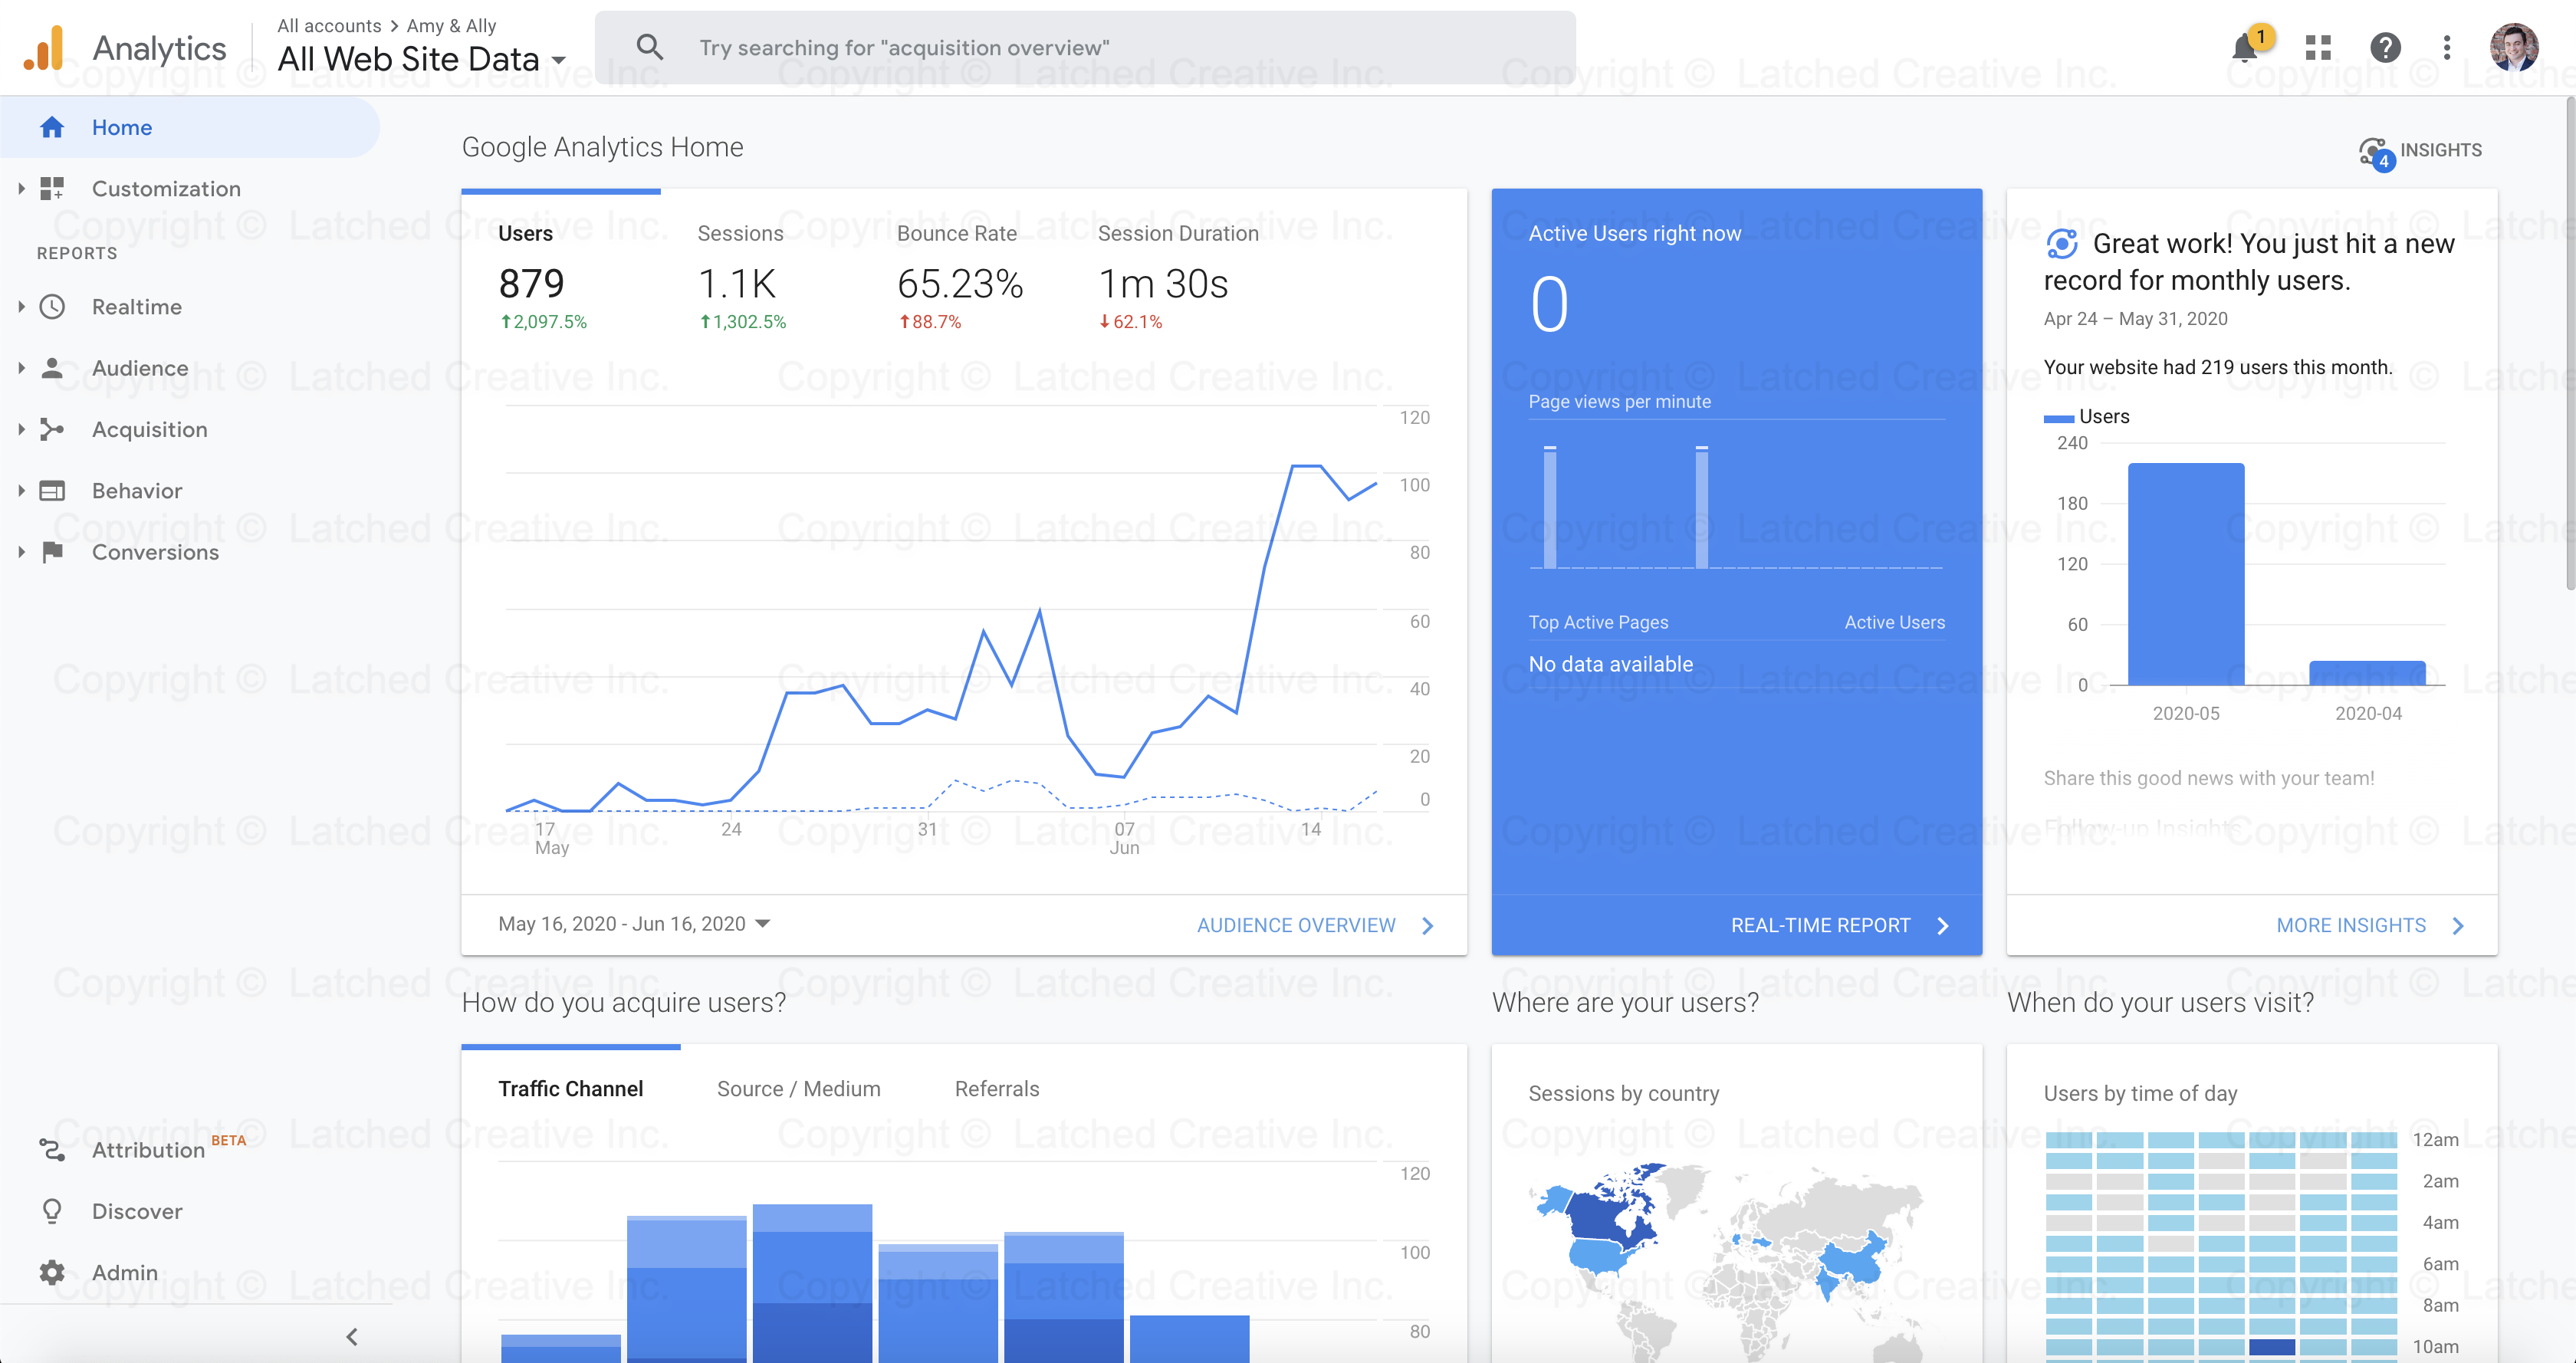 Amy & Ally Google Analytics Data 1